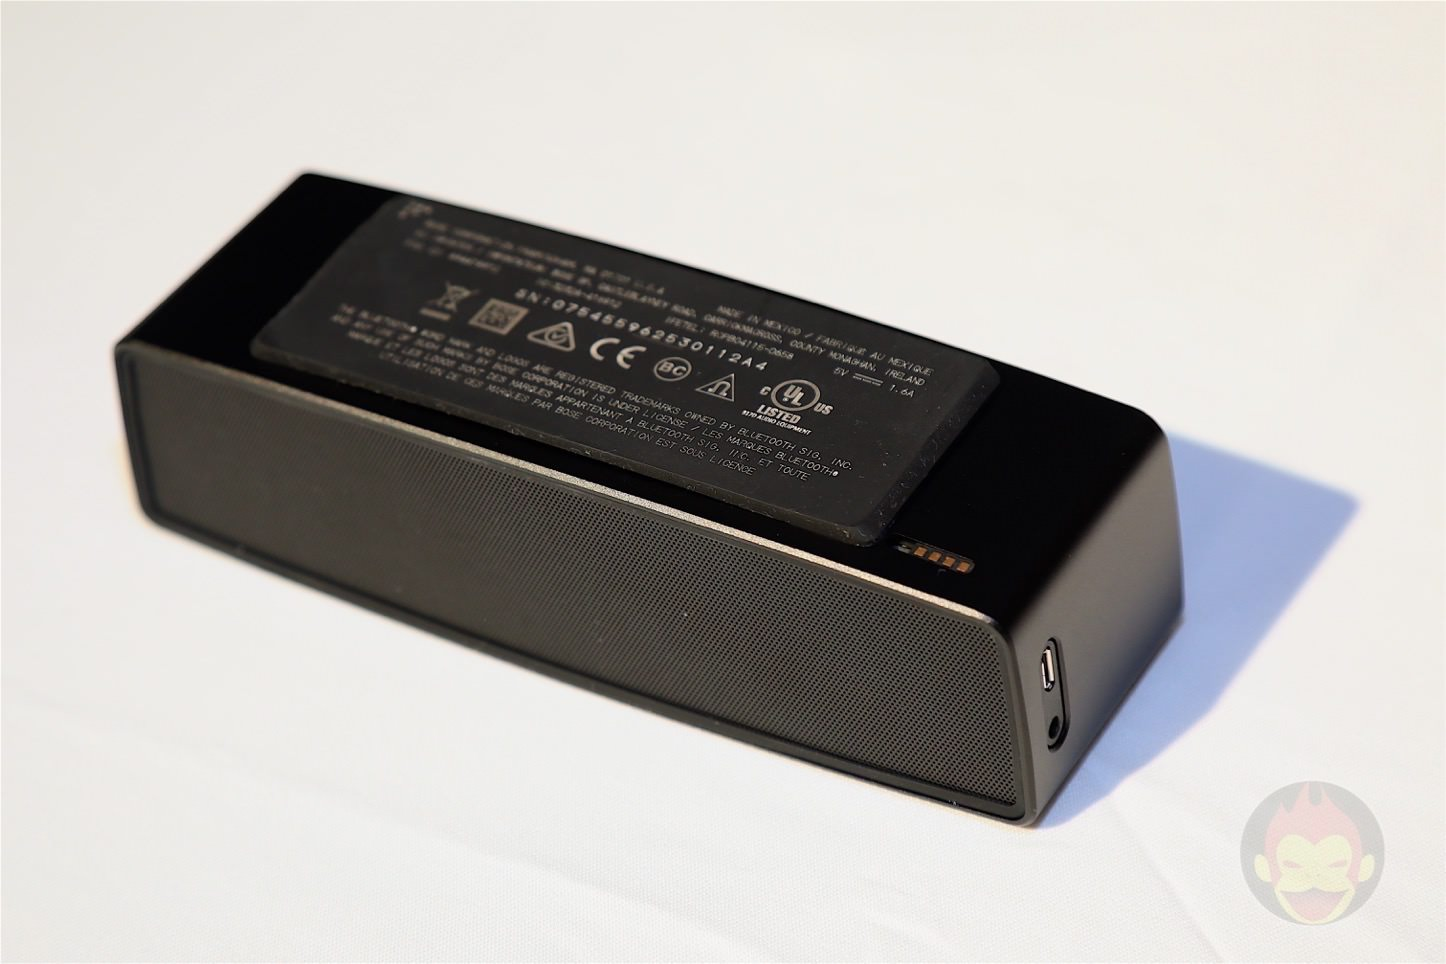 Bose-Soundlink-Mini-2-Black-Copper-08.jpg